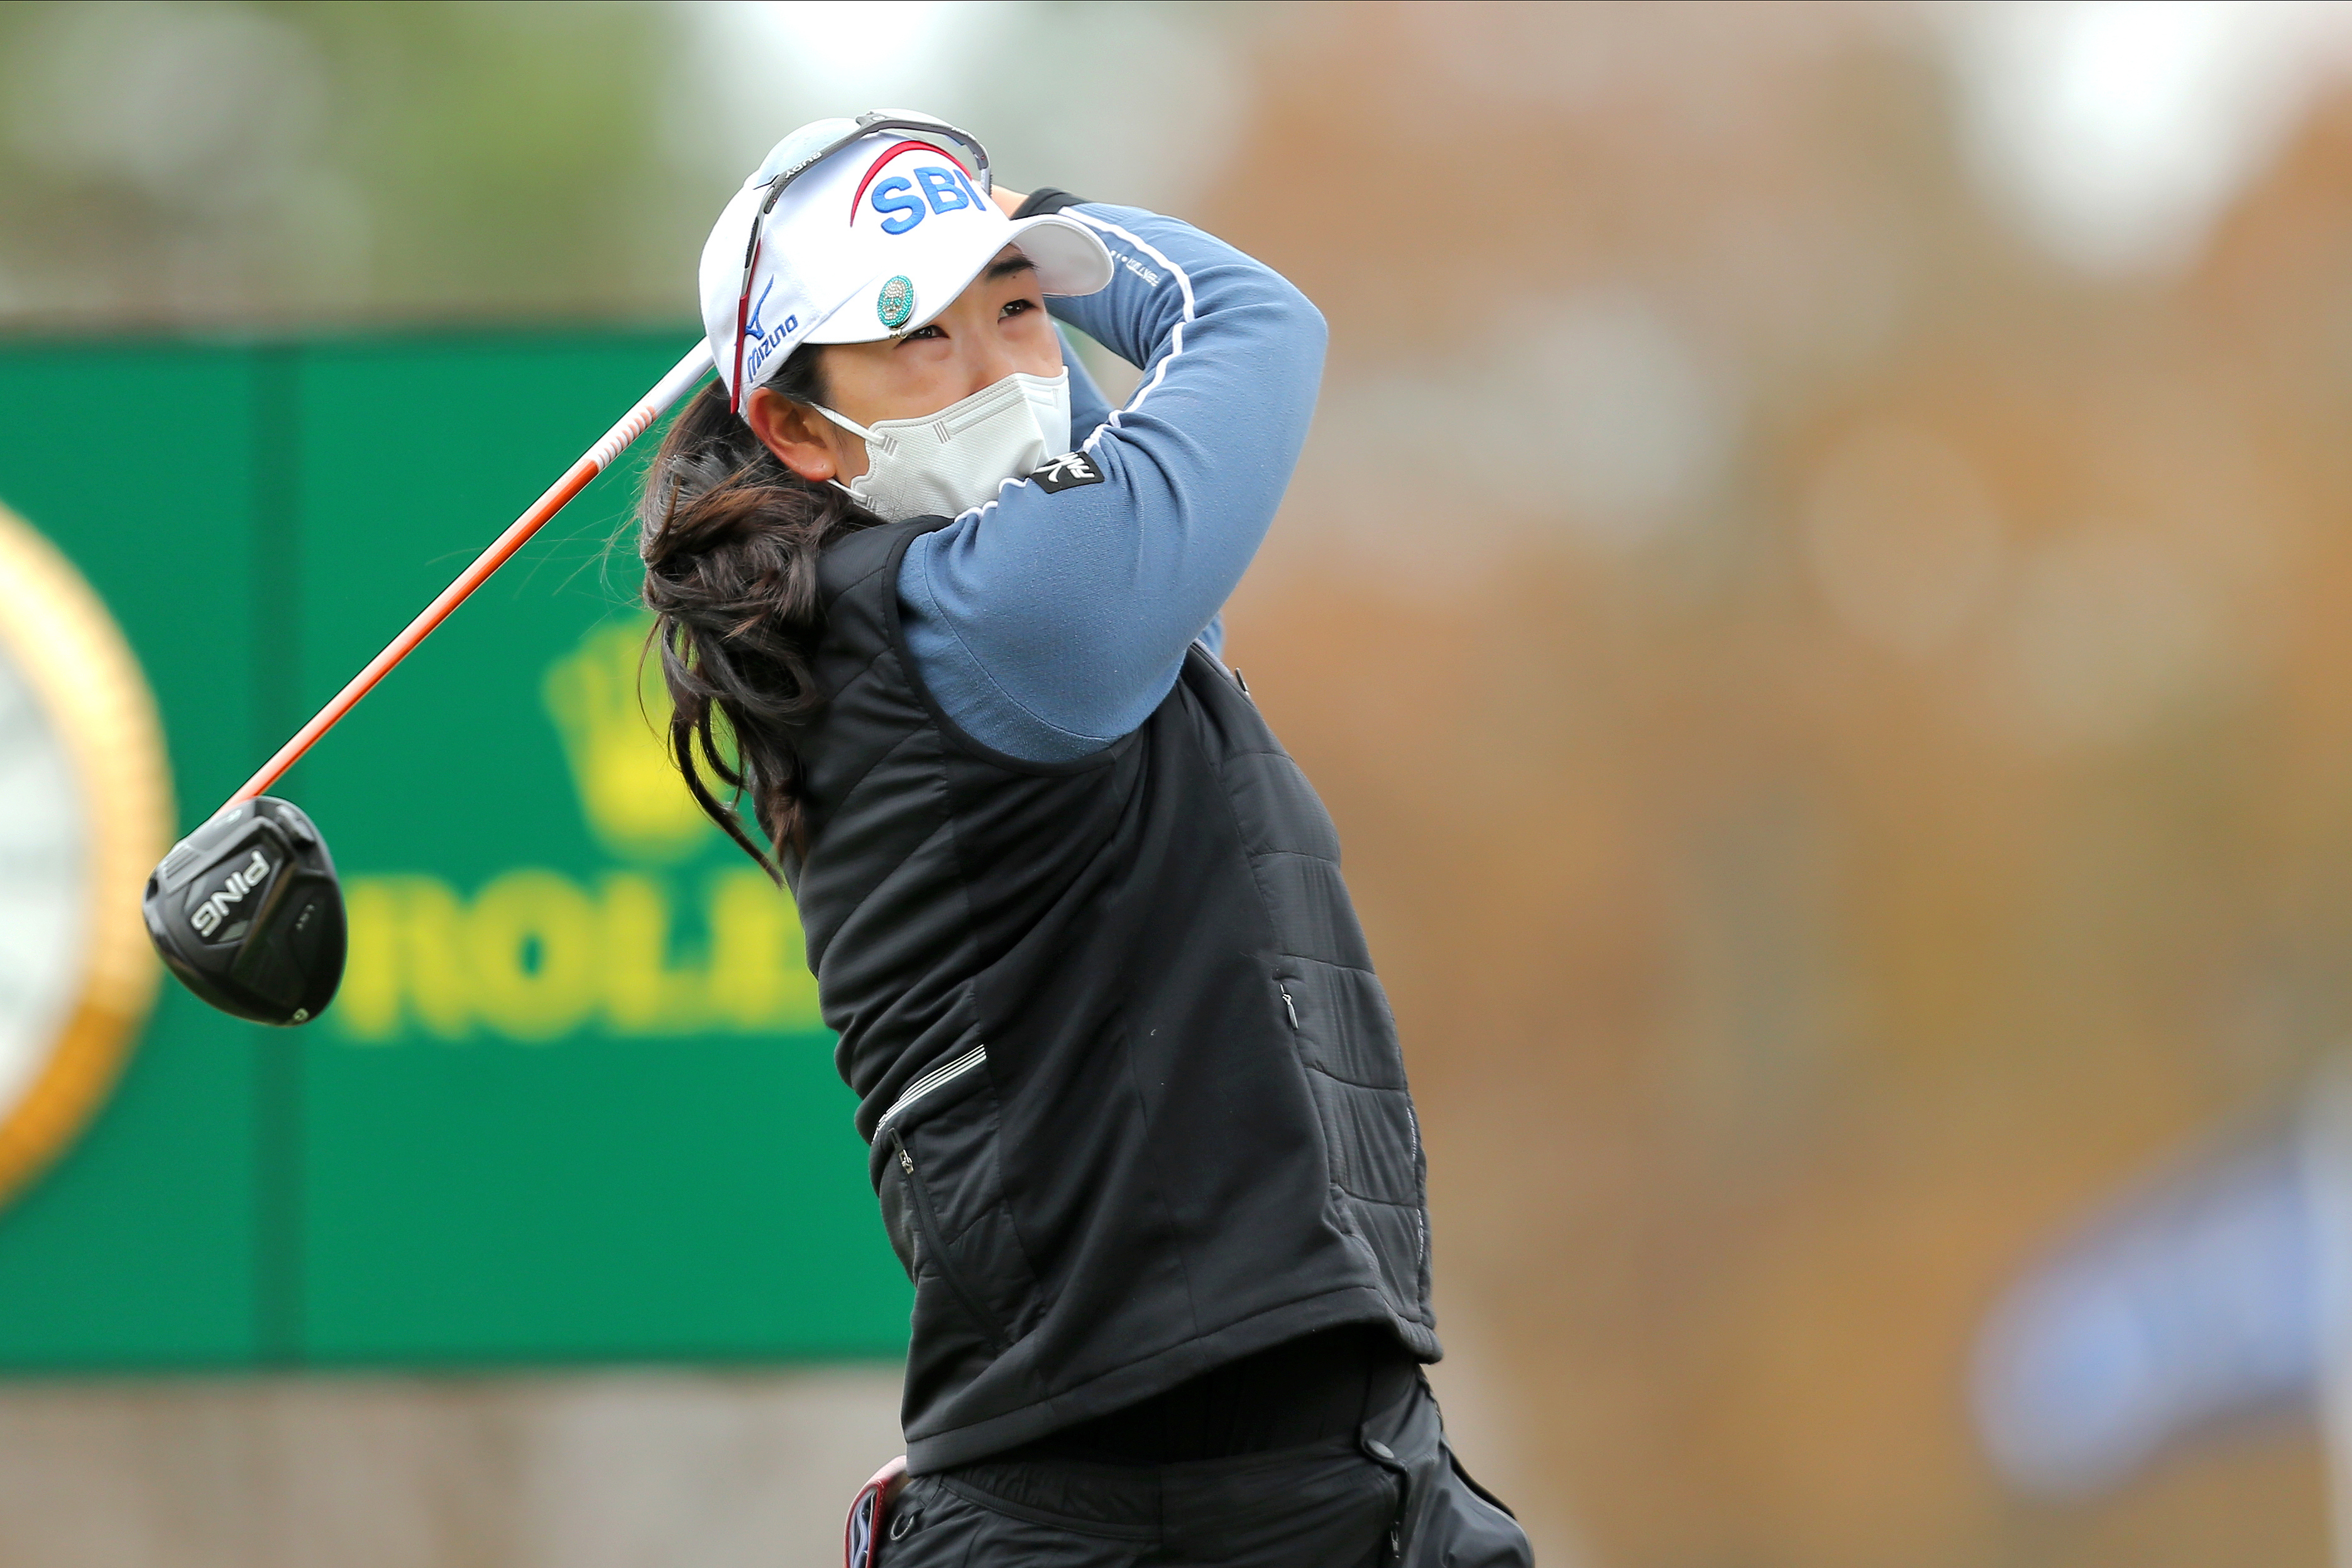 A Lim Kim wins US Women's Open